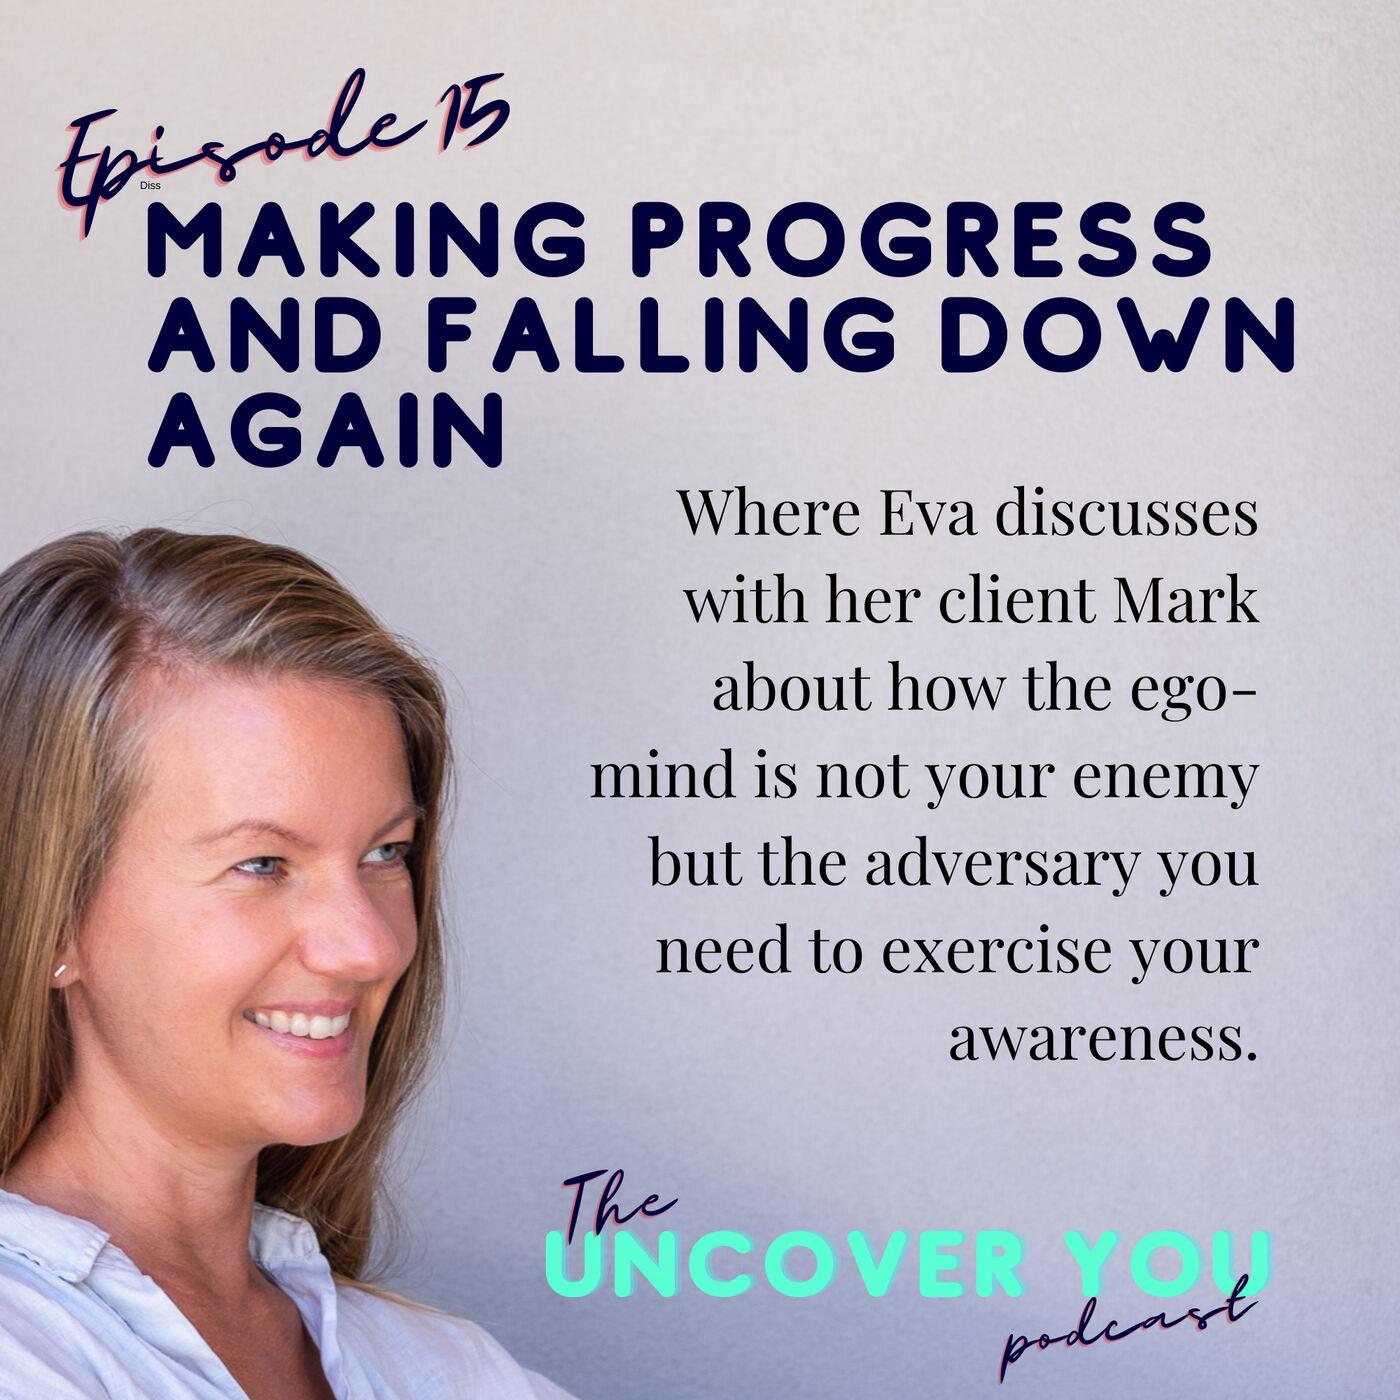 Ep 15: Making progress and falling down again